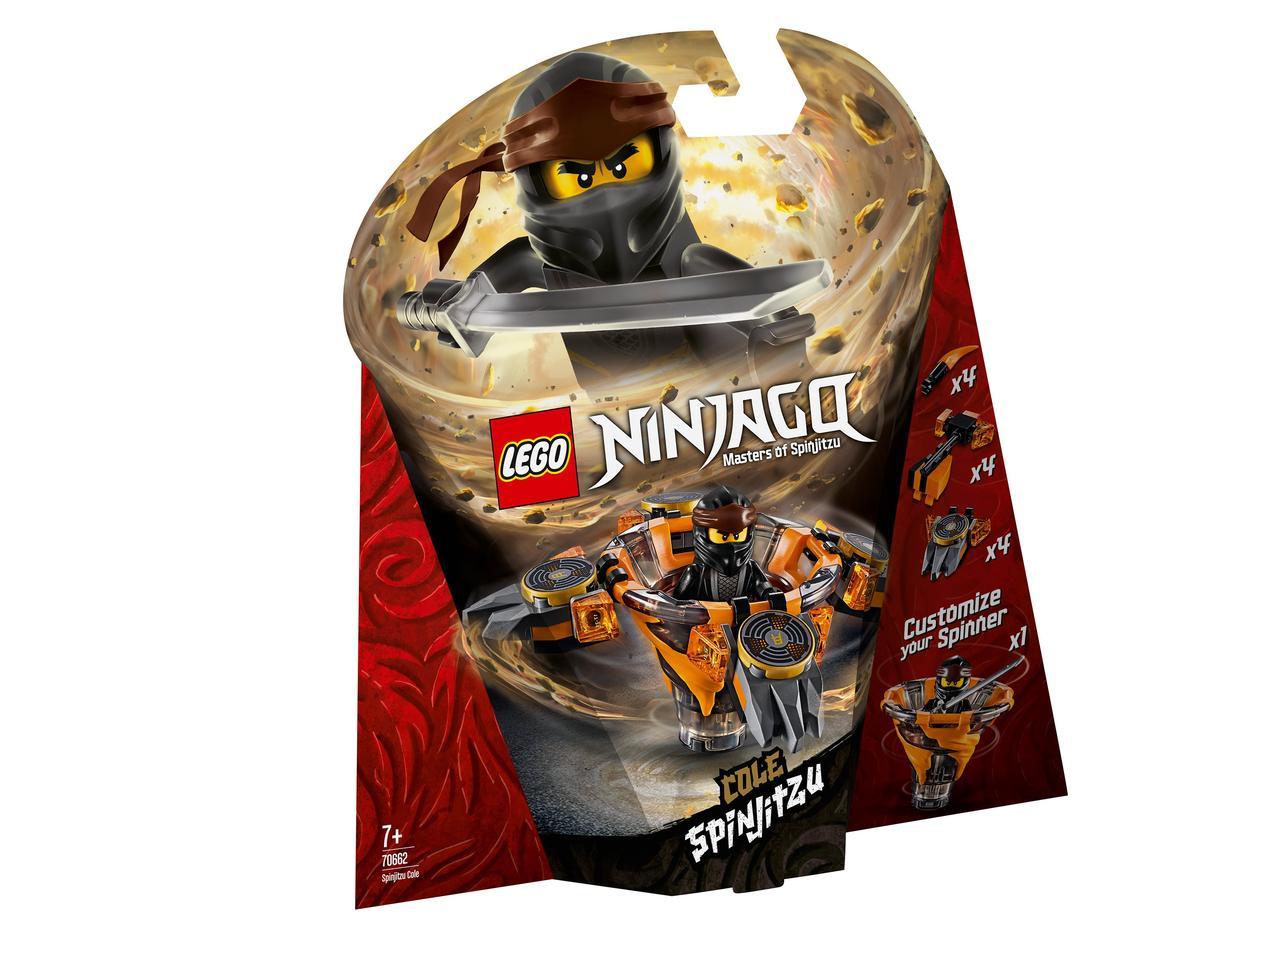 70662 Lego Ninjago Коул: мастер Кружитцу, Лего Ниндзяго